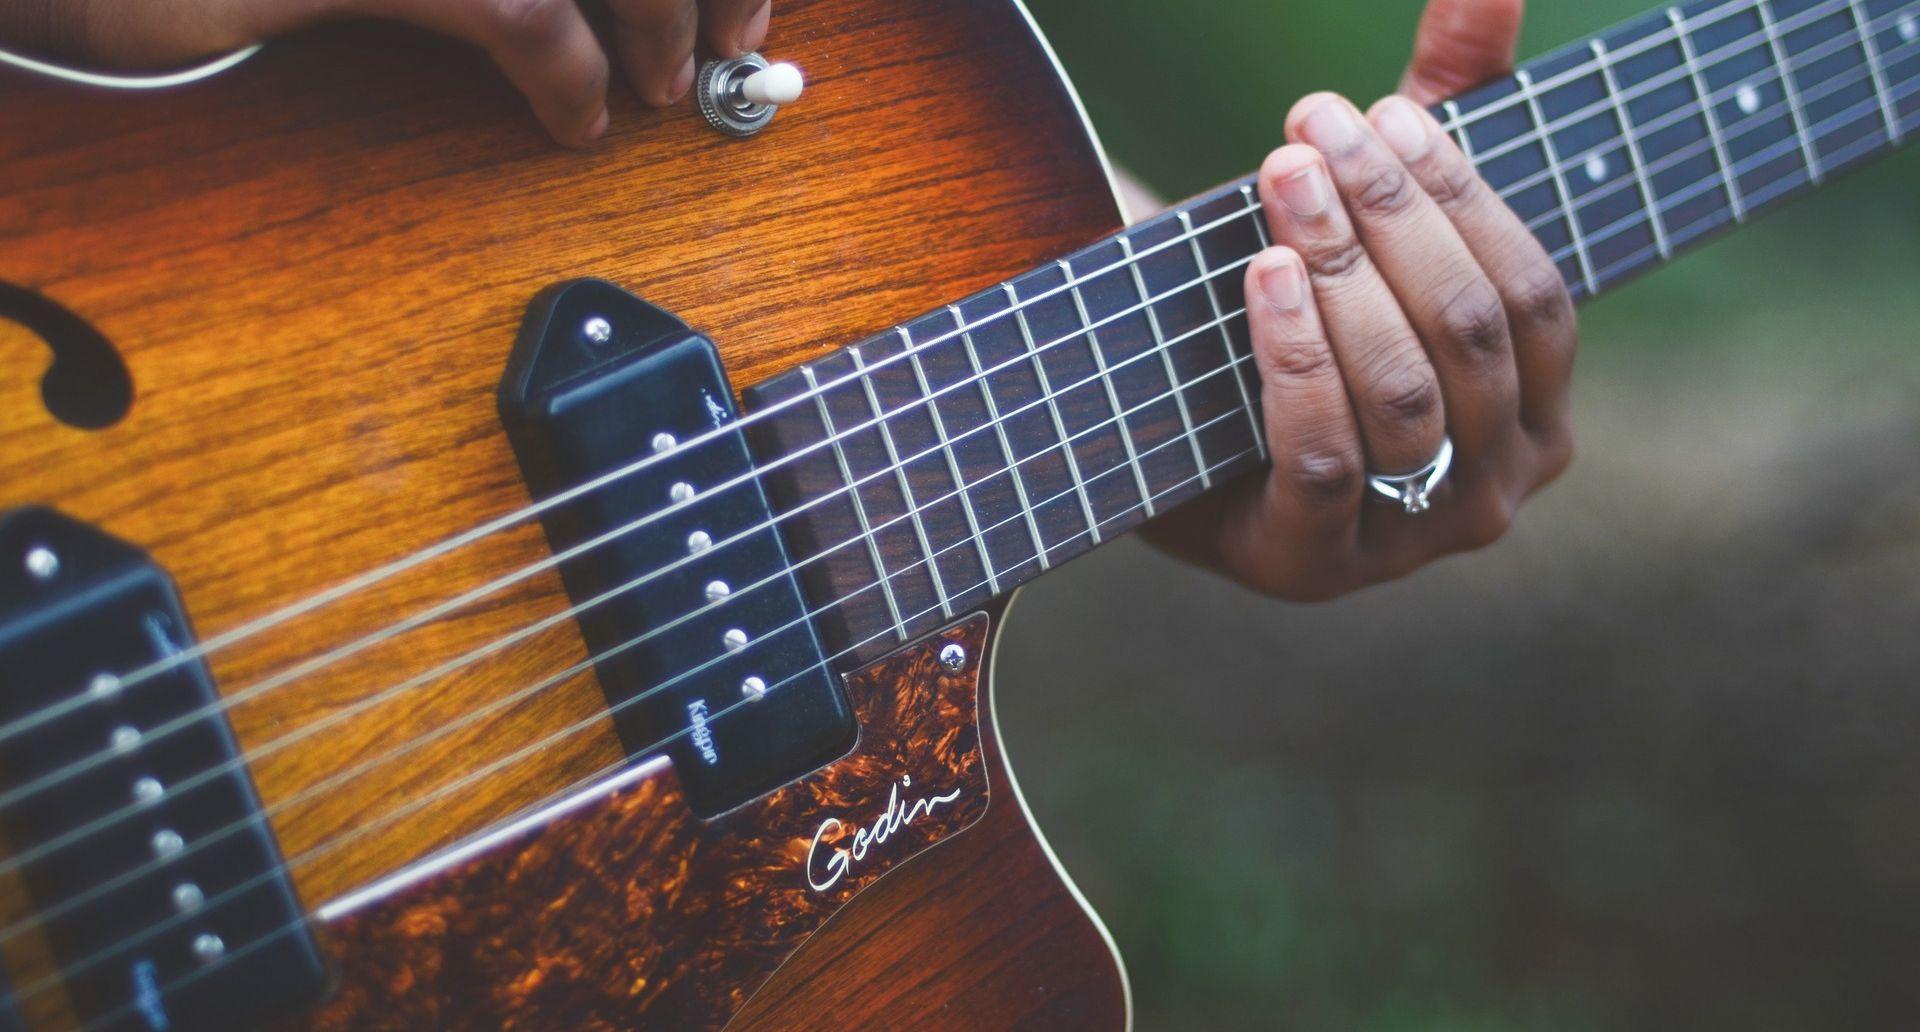 """Siscia jazz & blues festival"" od 20. lipnja"